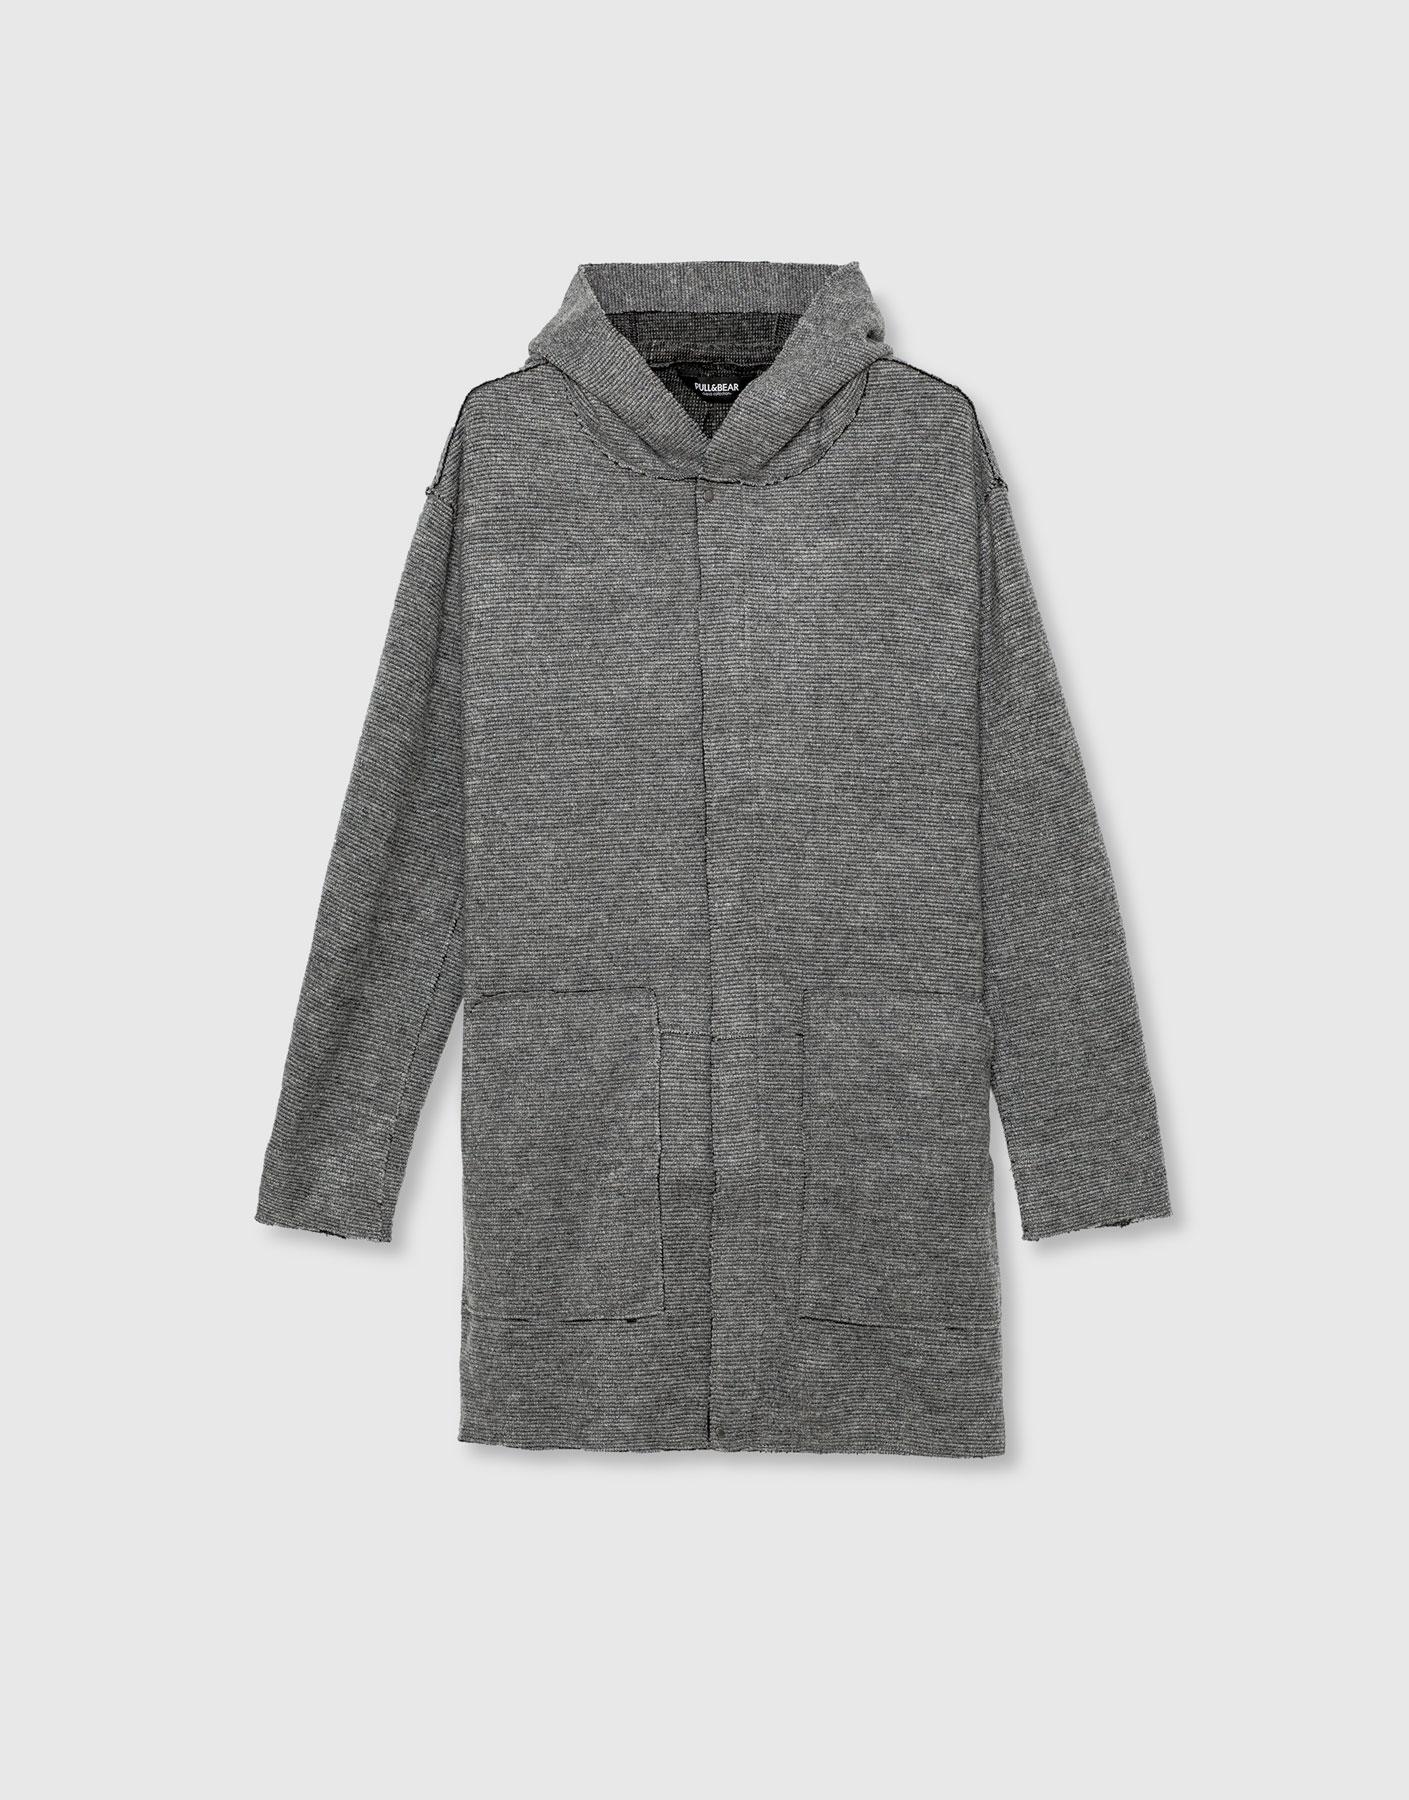 Flowing hooded coat, £49.99 ( pullandbear.com )